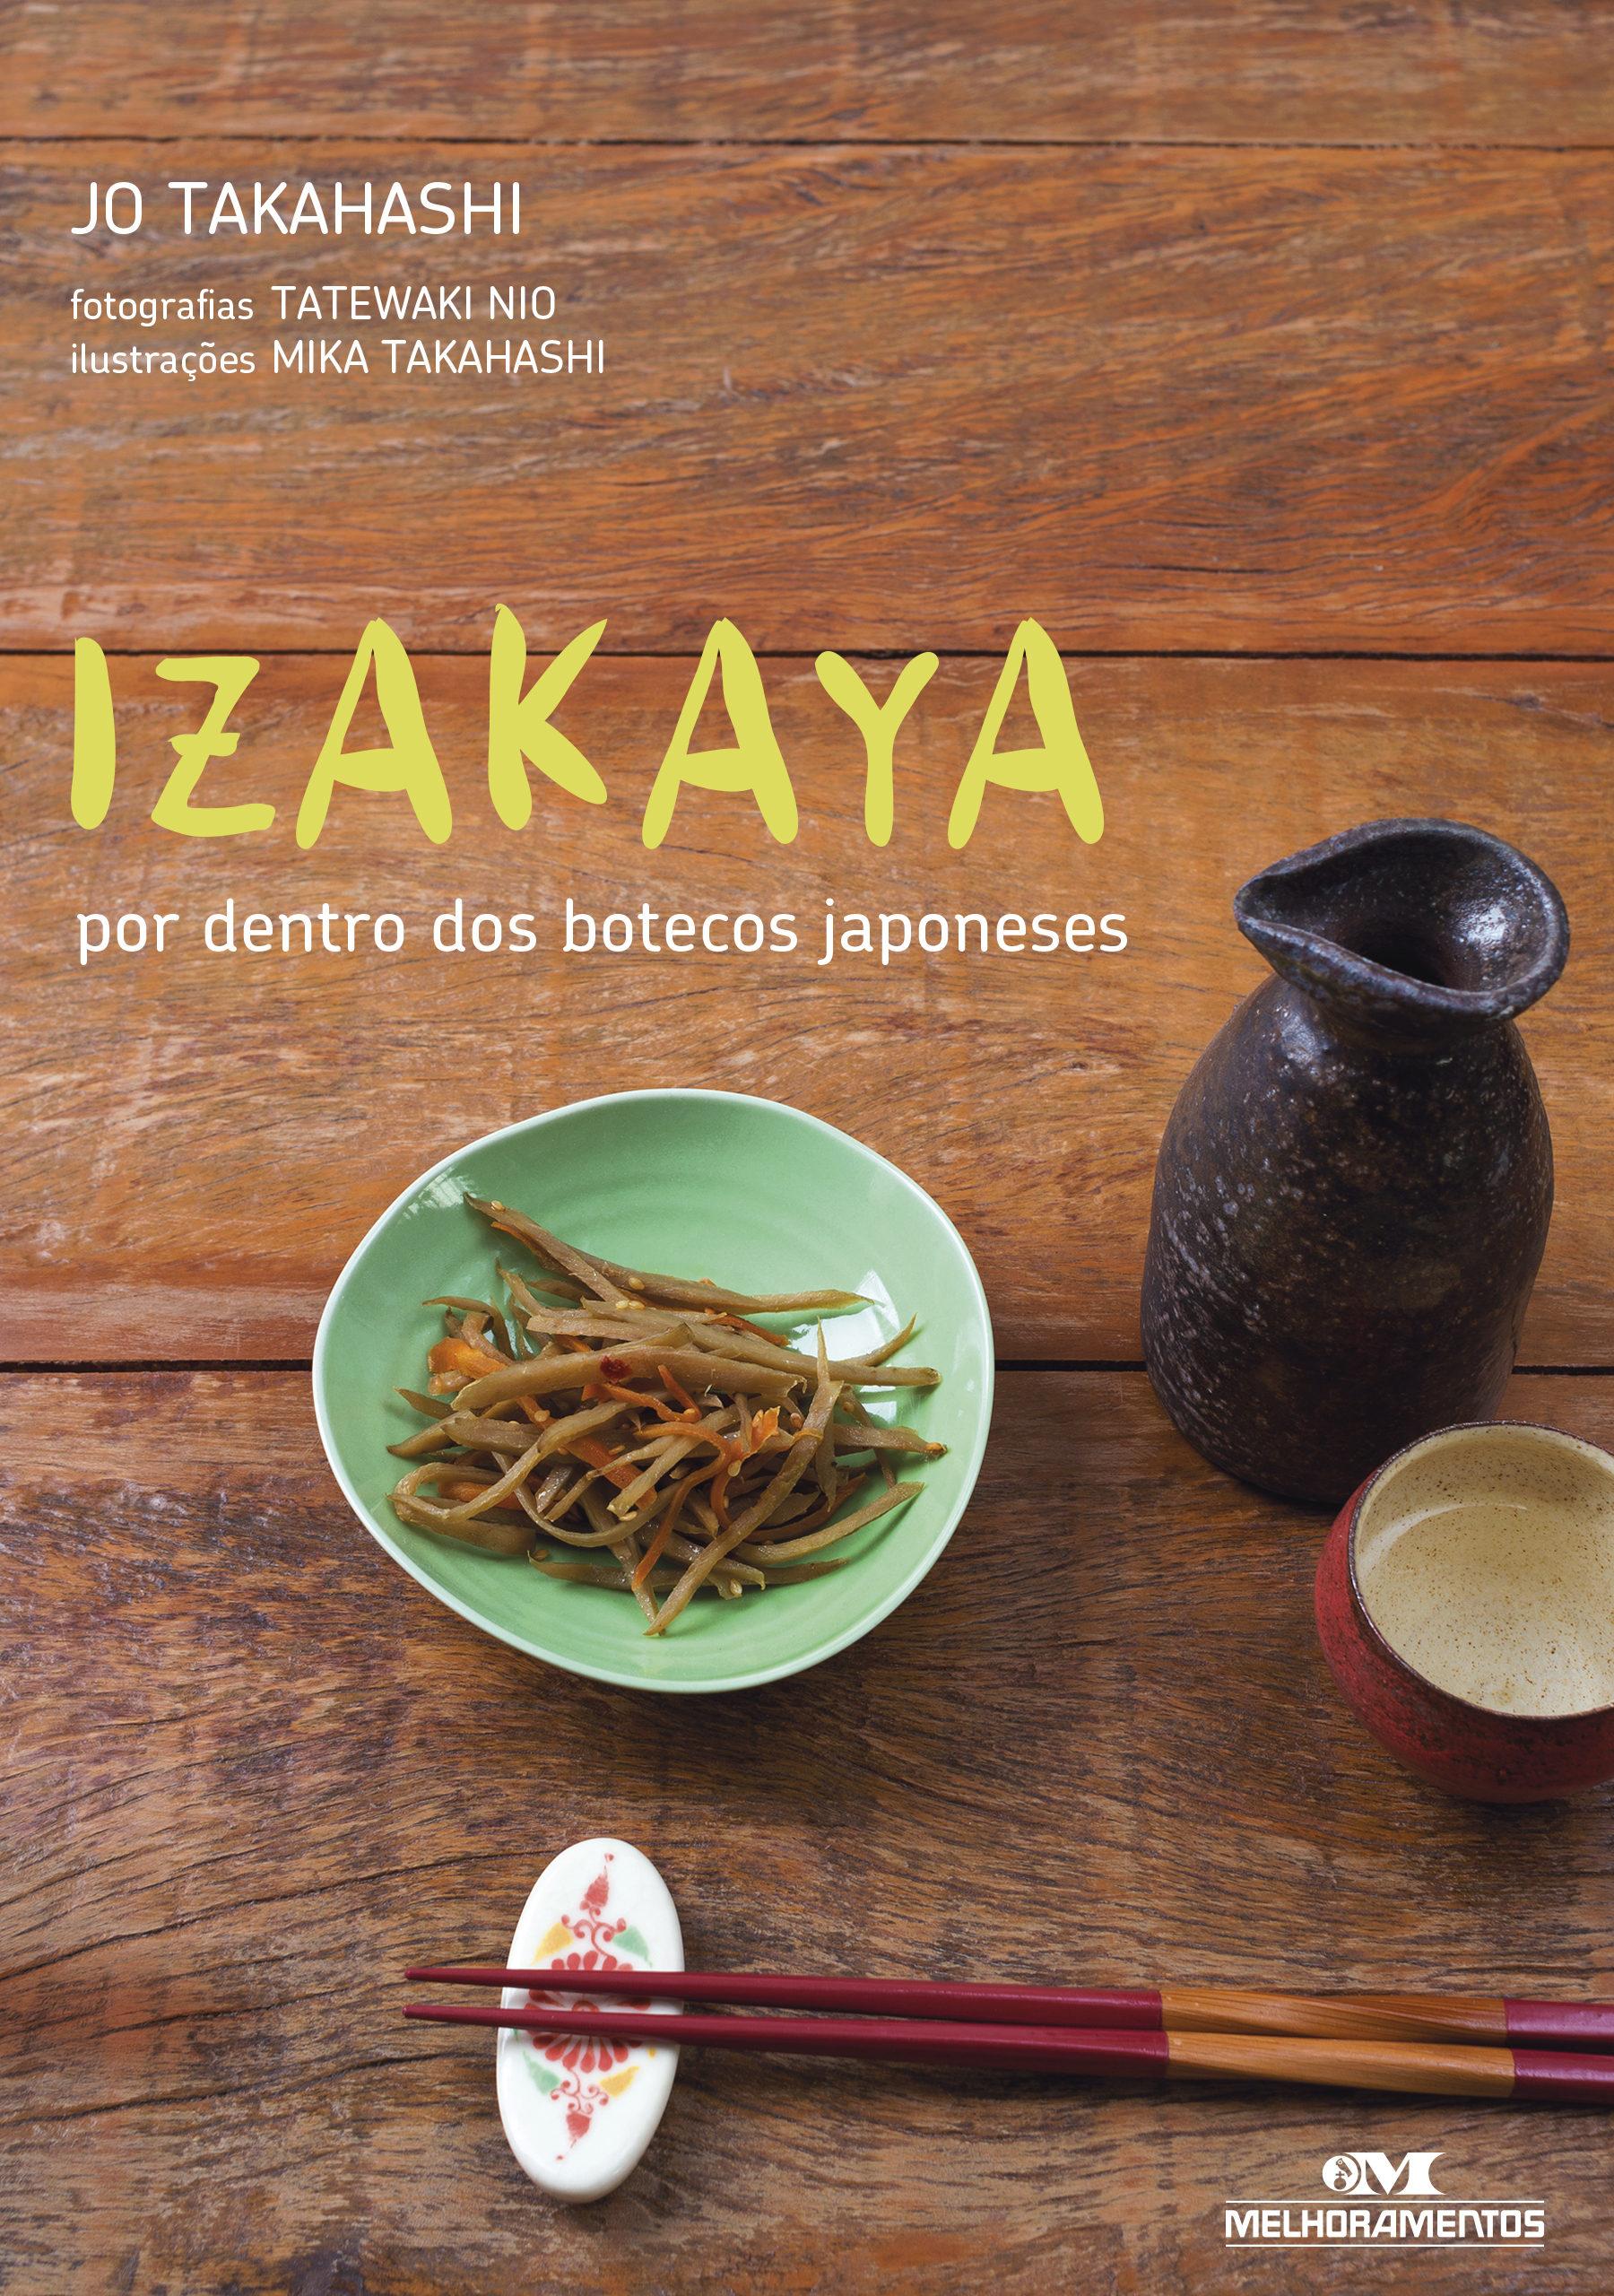 Izakaya por dentro dos botecos japoneses ebook jo takahashi izakaya por dentro dos botecos japoneses ebook jo takahashi 9788506026953 forumfinder Gallery